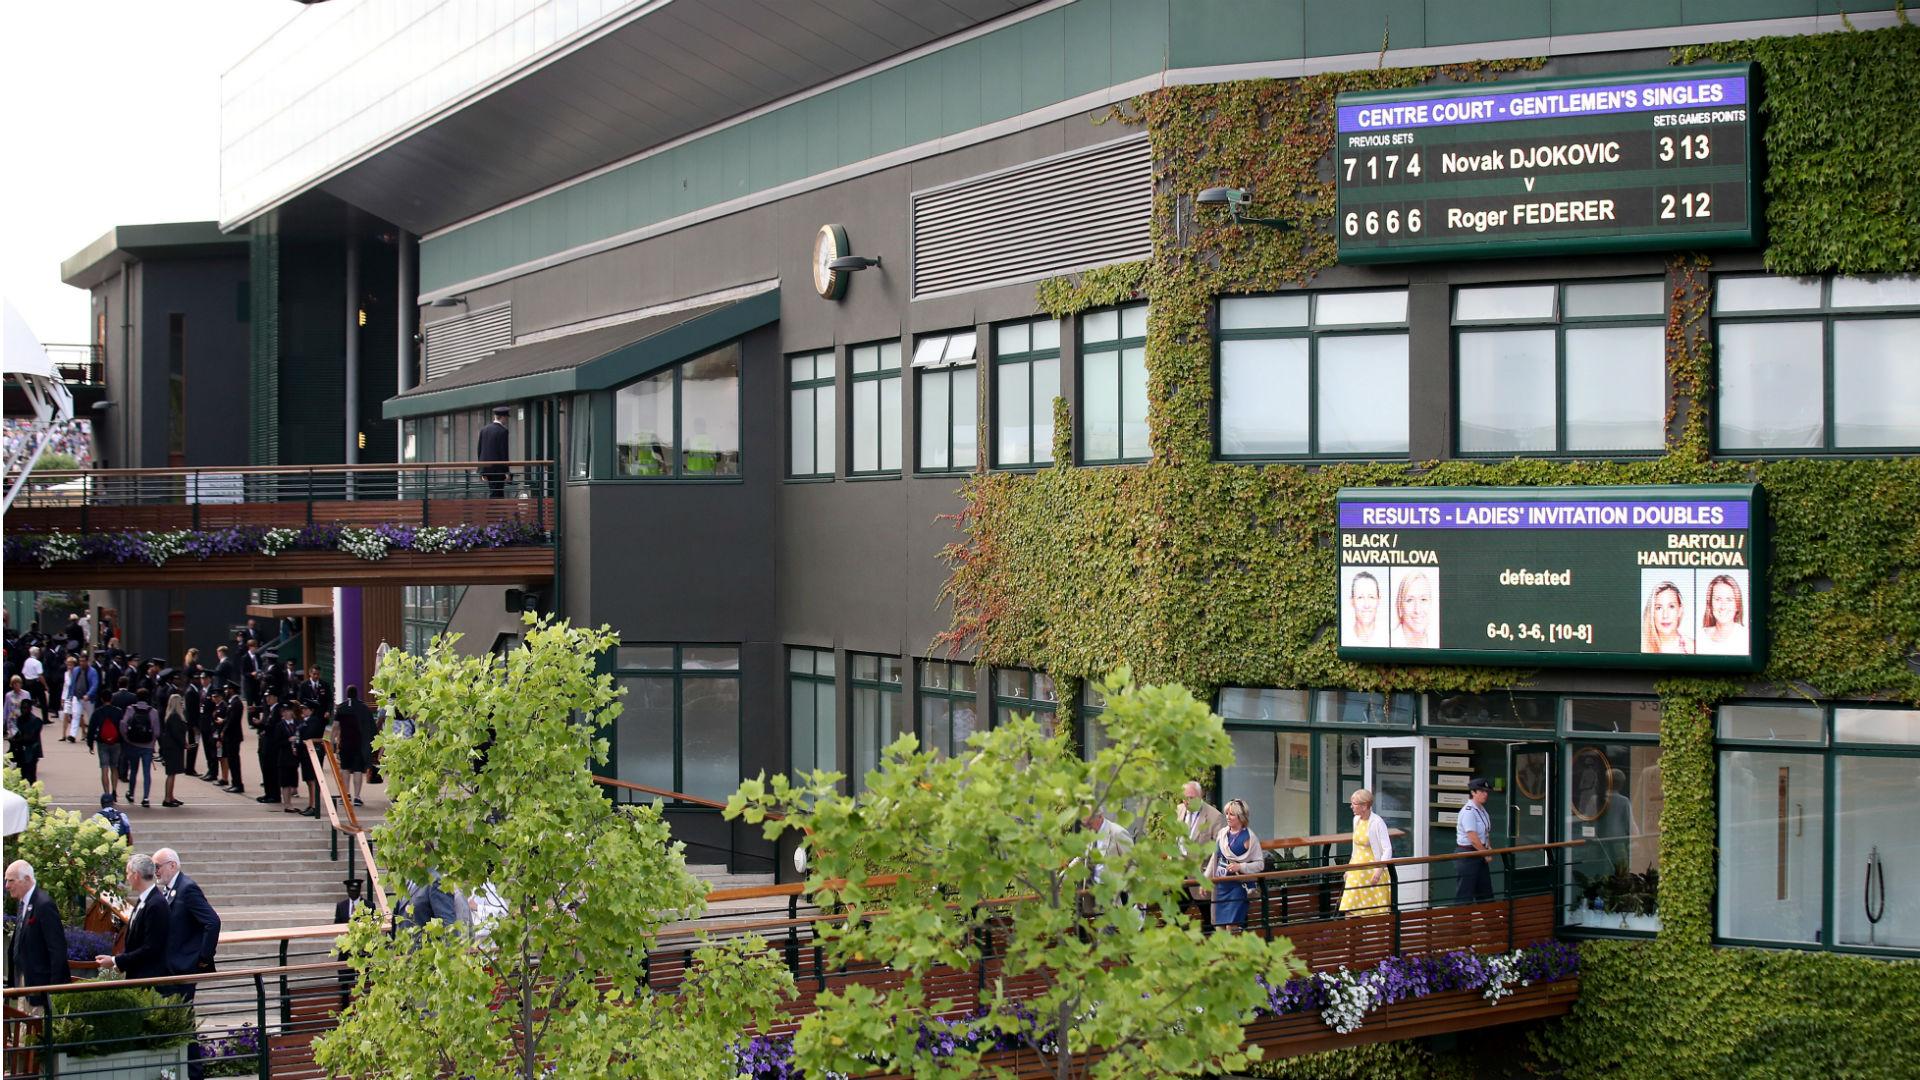 Coronavirus: Wimbledon 2020 decision next week as organisers confirm emergency meeting